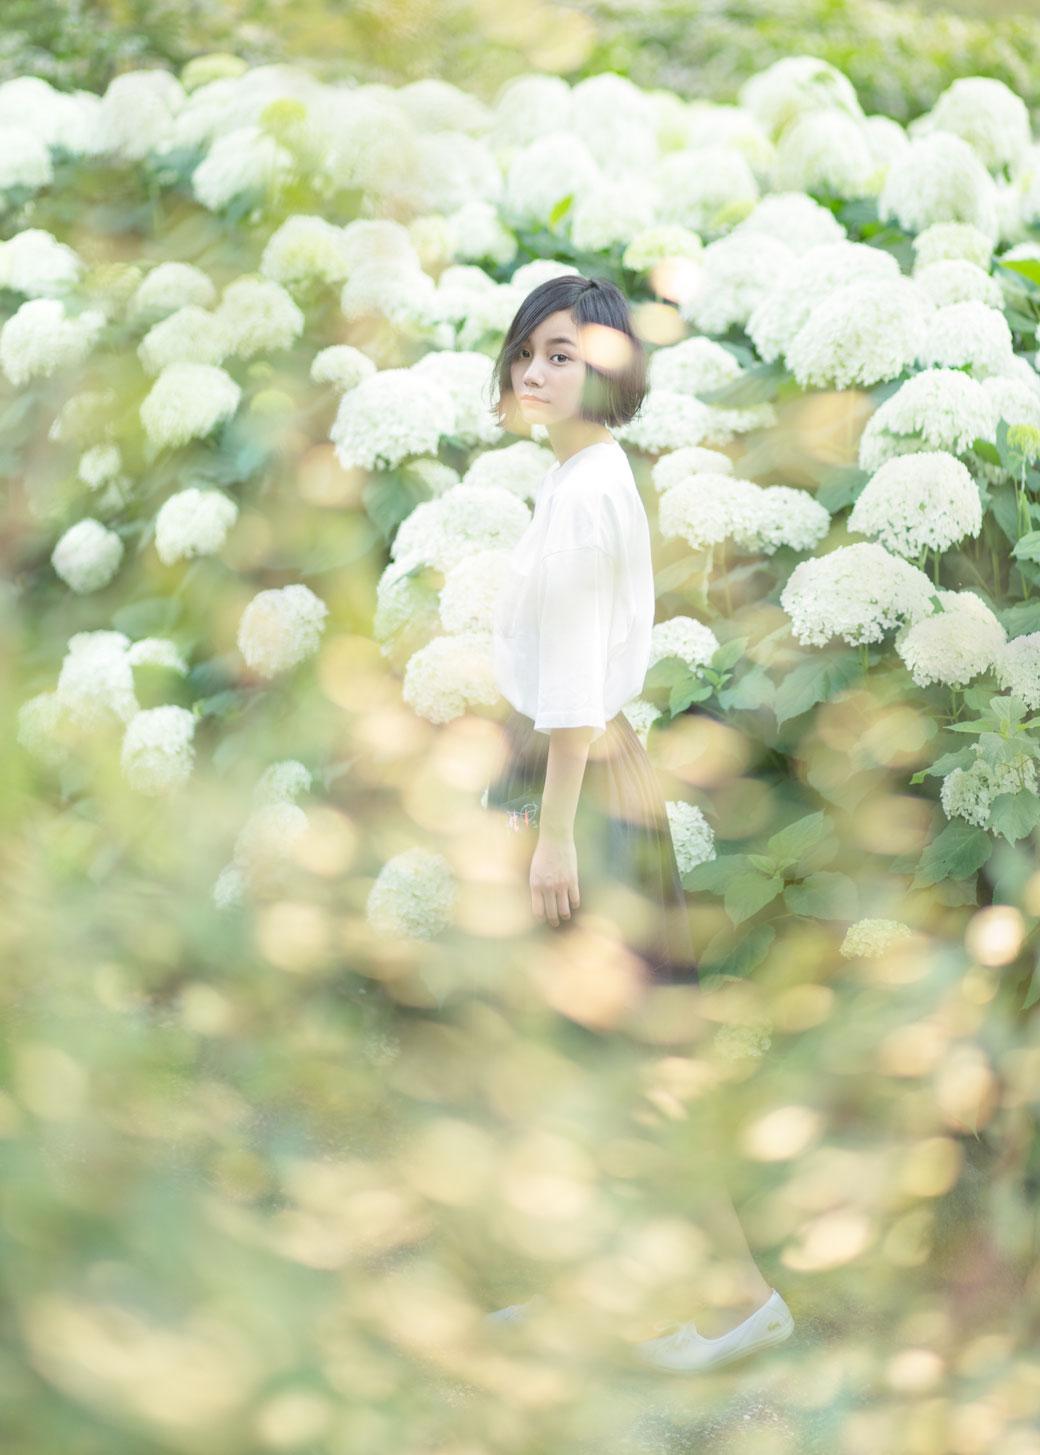 氷森記心 - KISHIN HIMORI